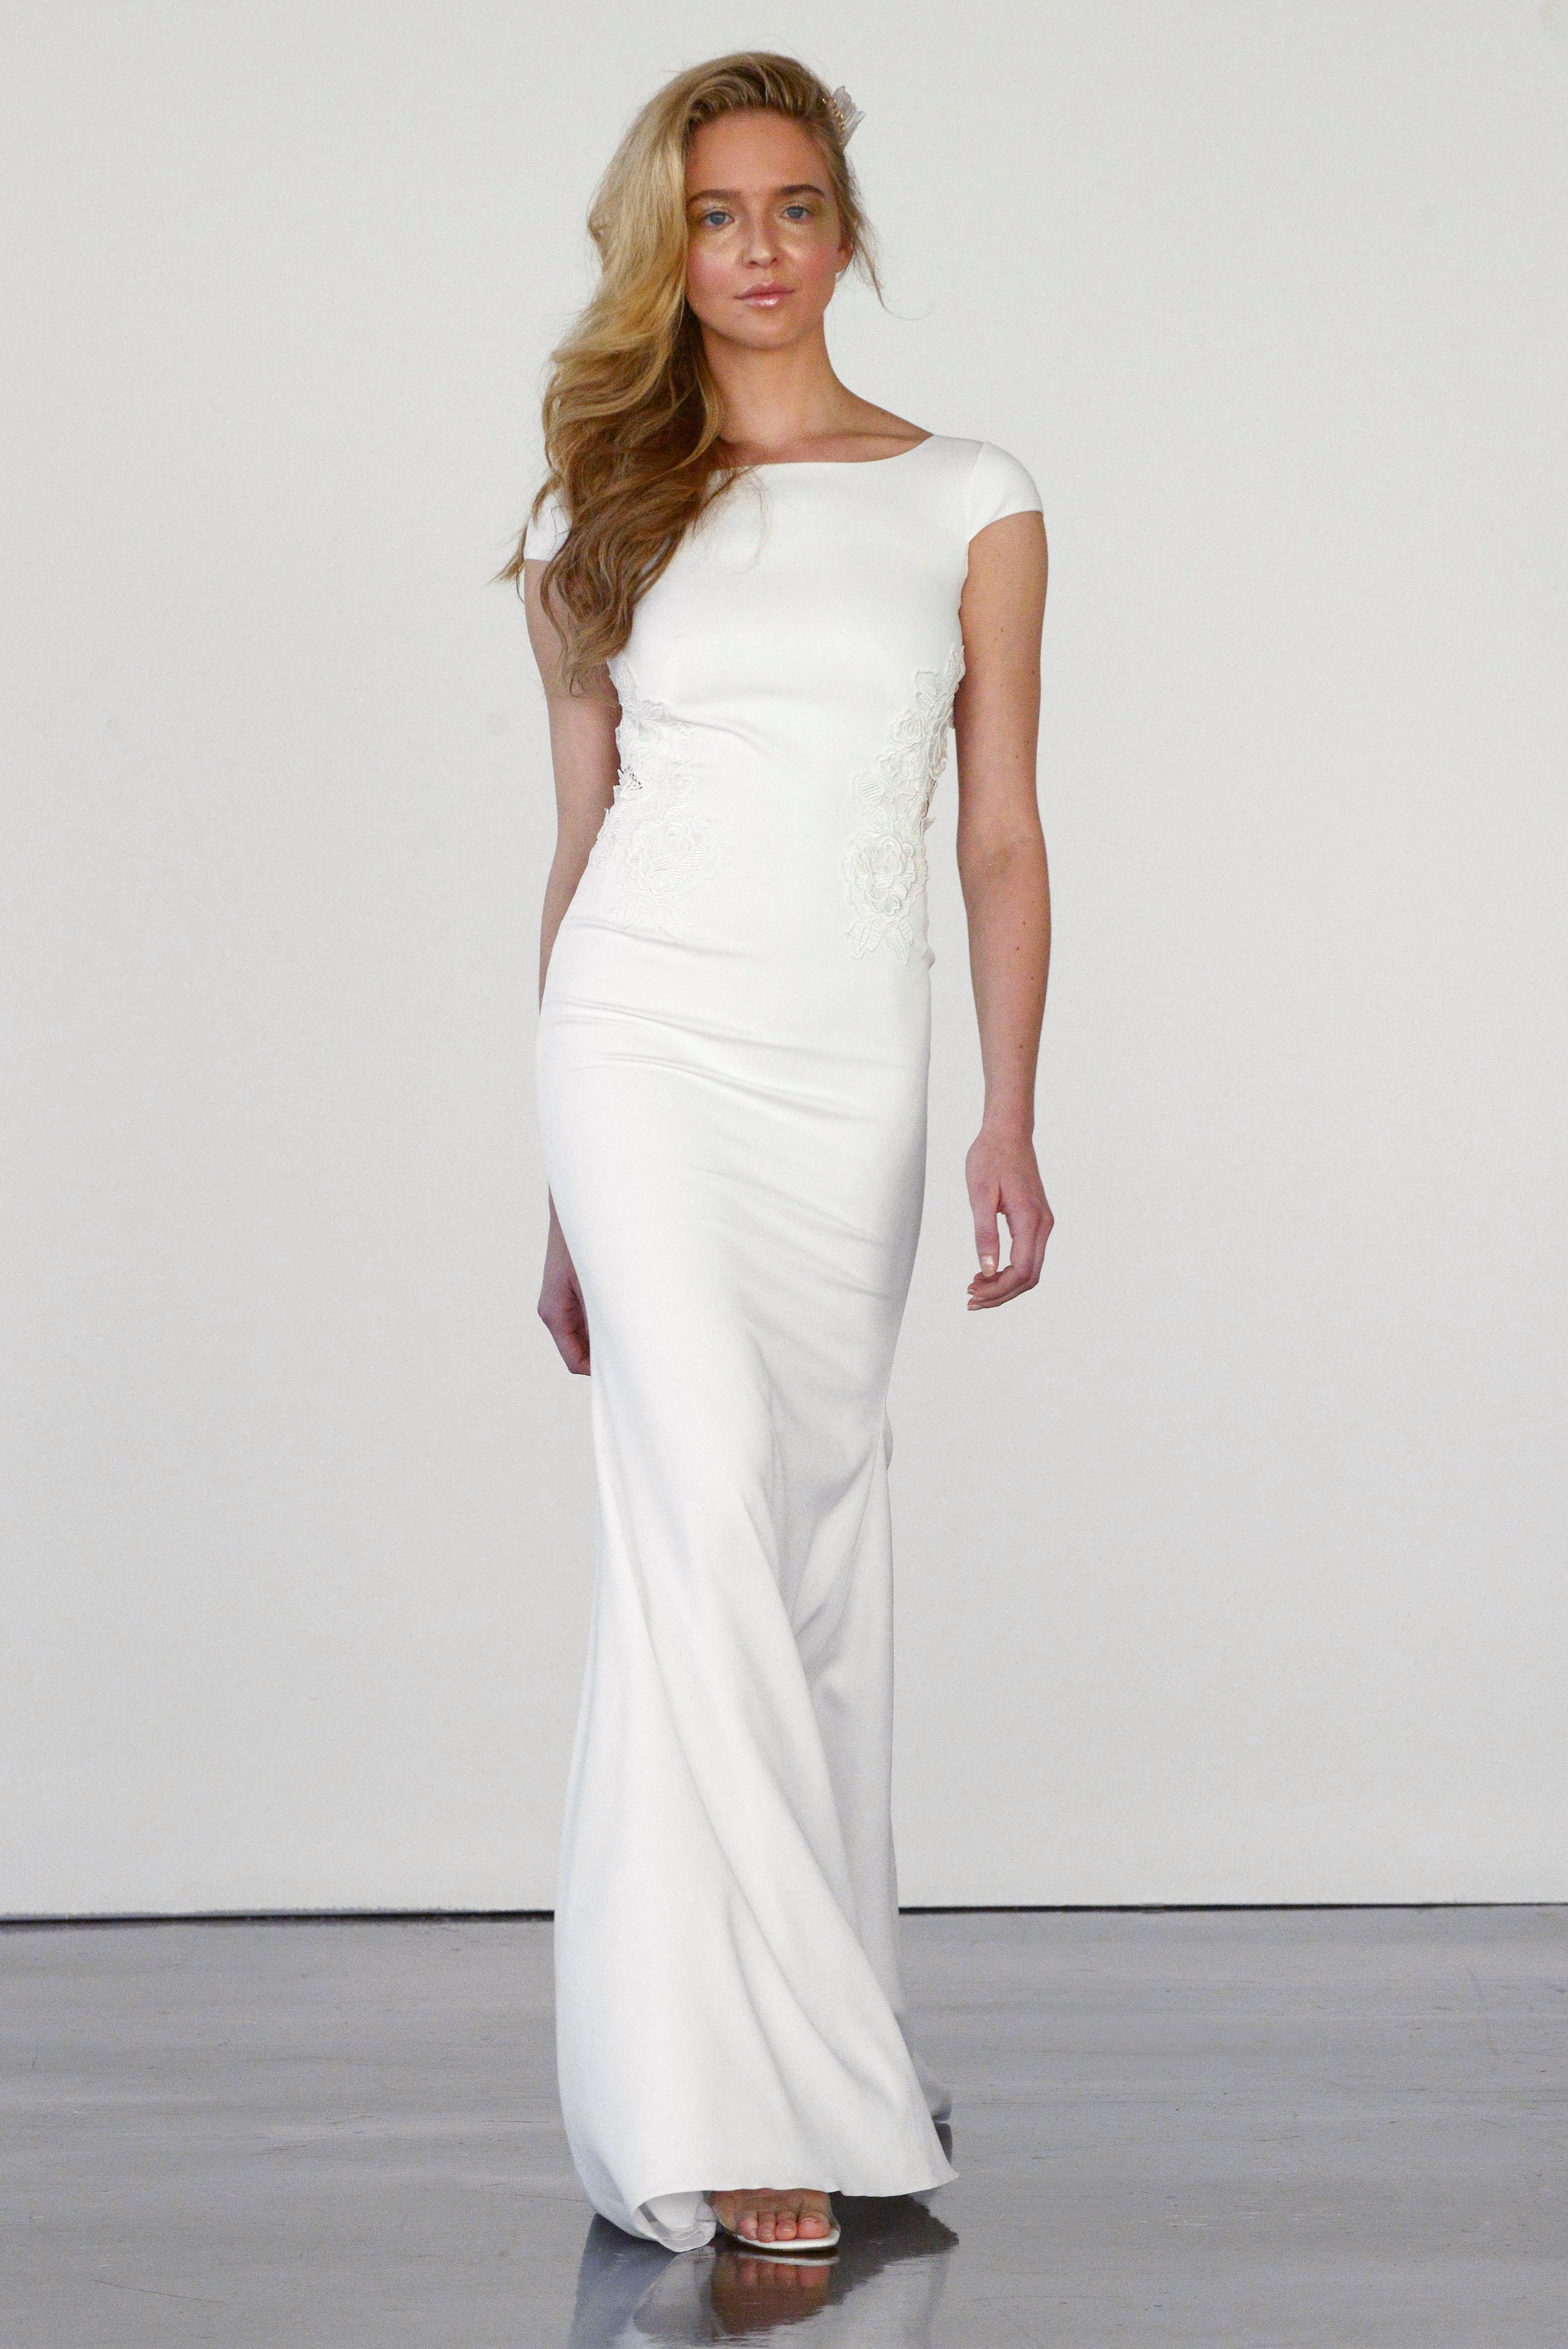 Rime Arodaky wedding dress 27 Fall 2017